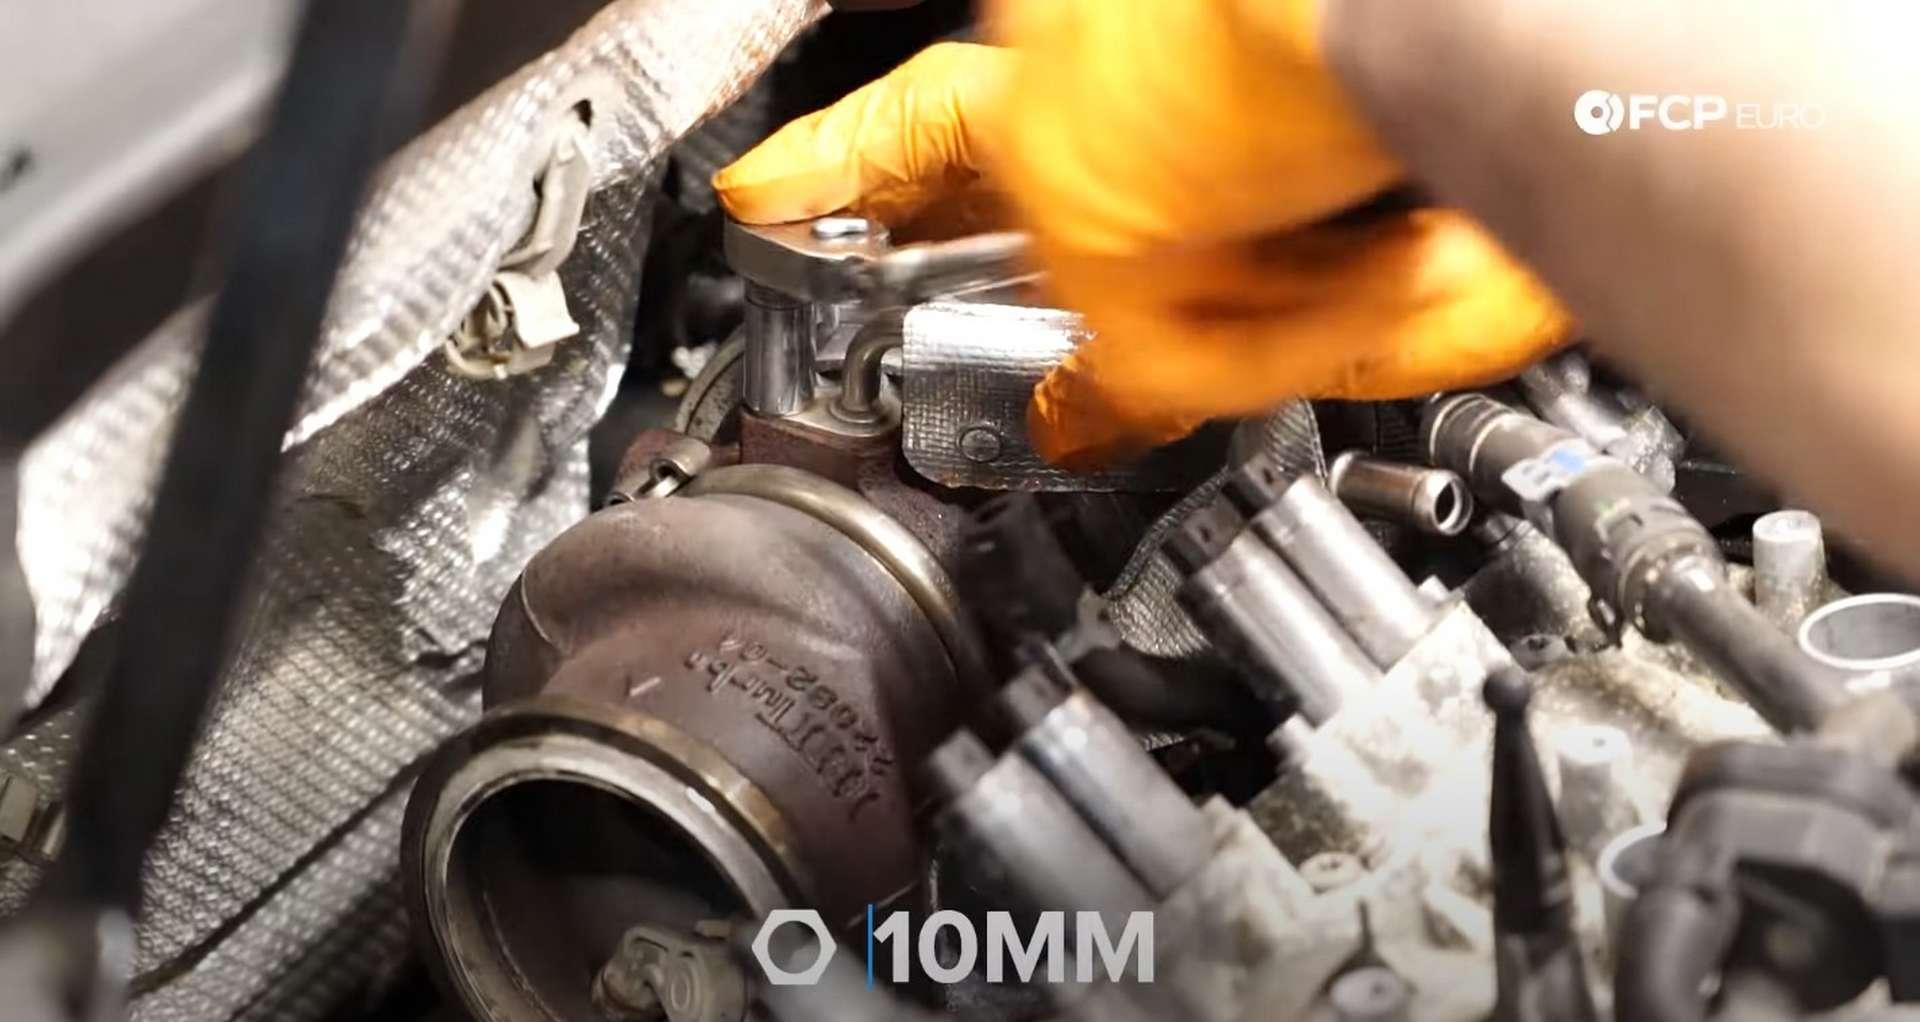 DIY MK7 VW GTI Turbocharger Upgrade removing oil feed line stud